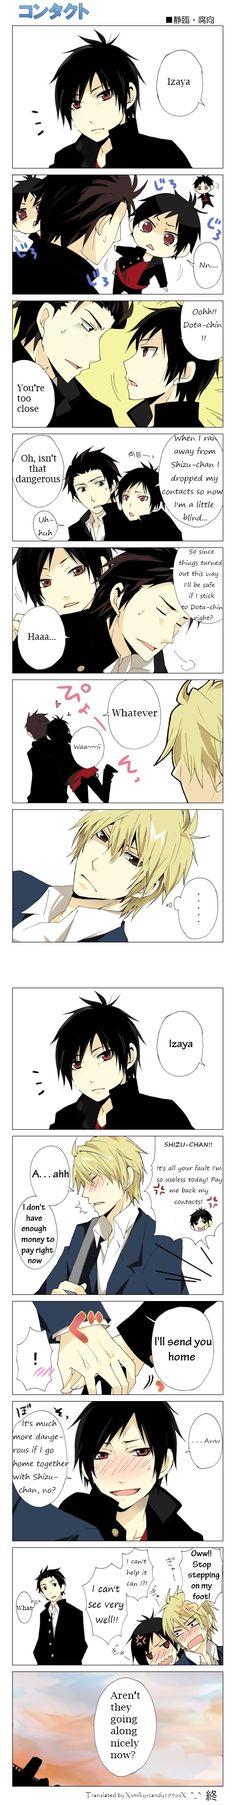 "Hahaha shizuo ""Stop stepping on my foot!!"""